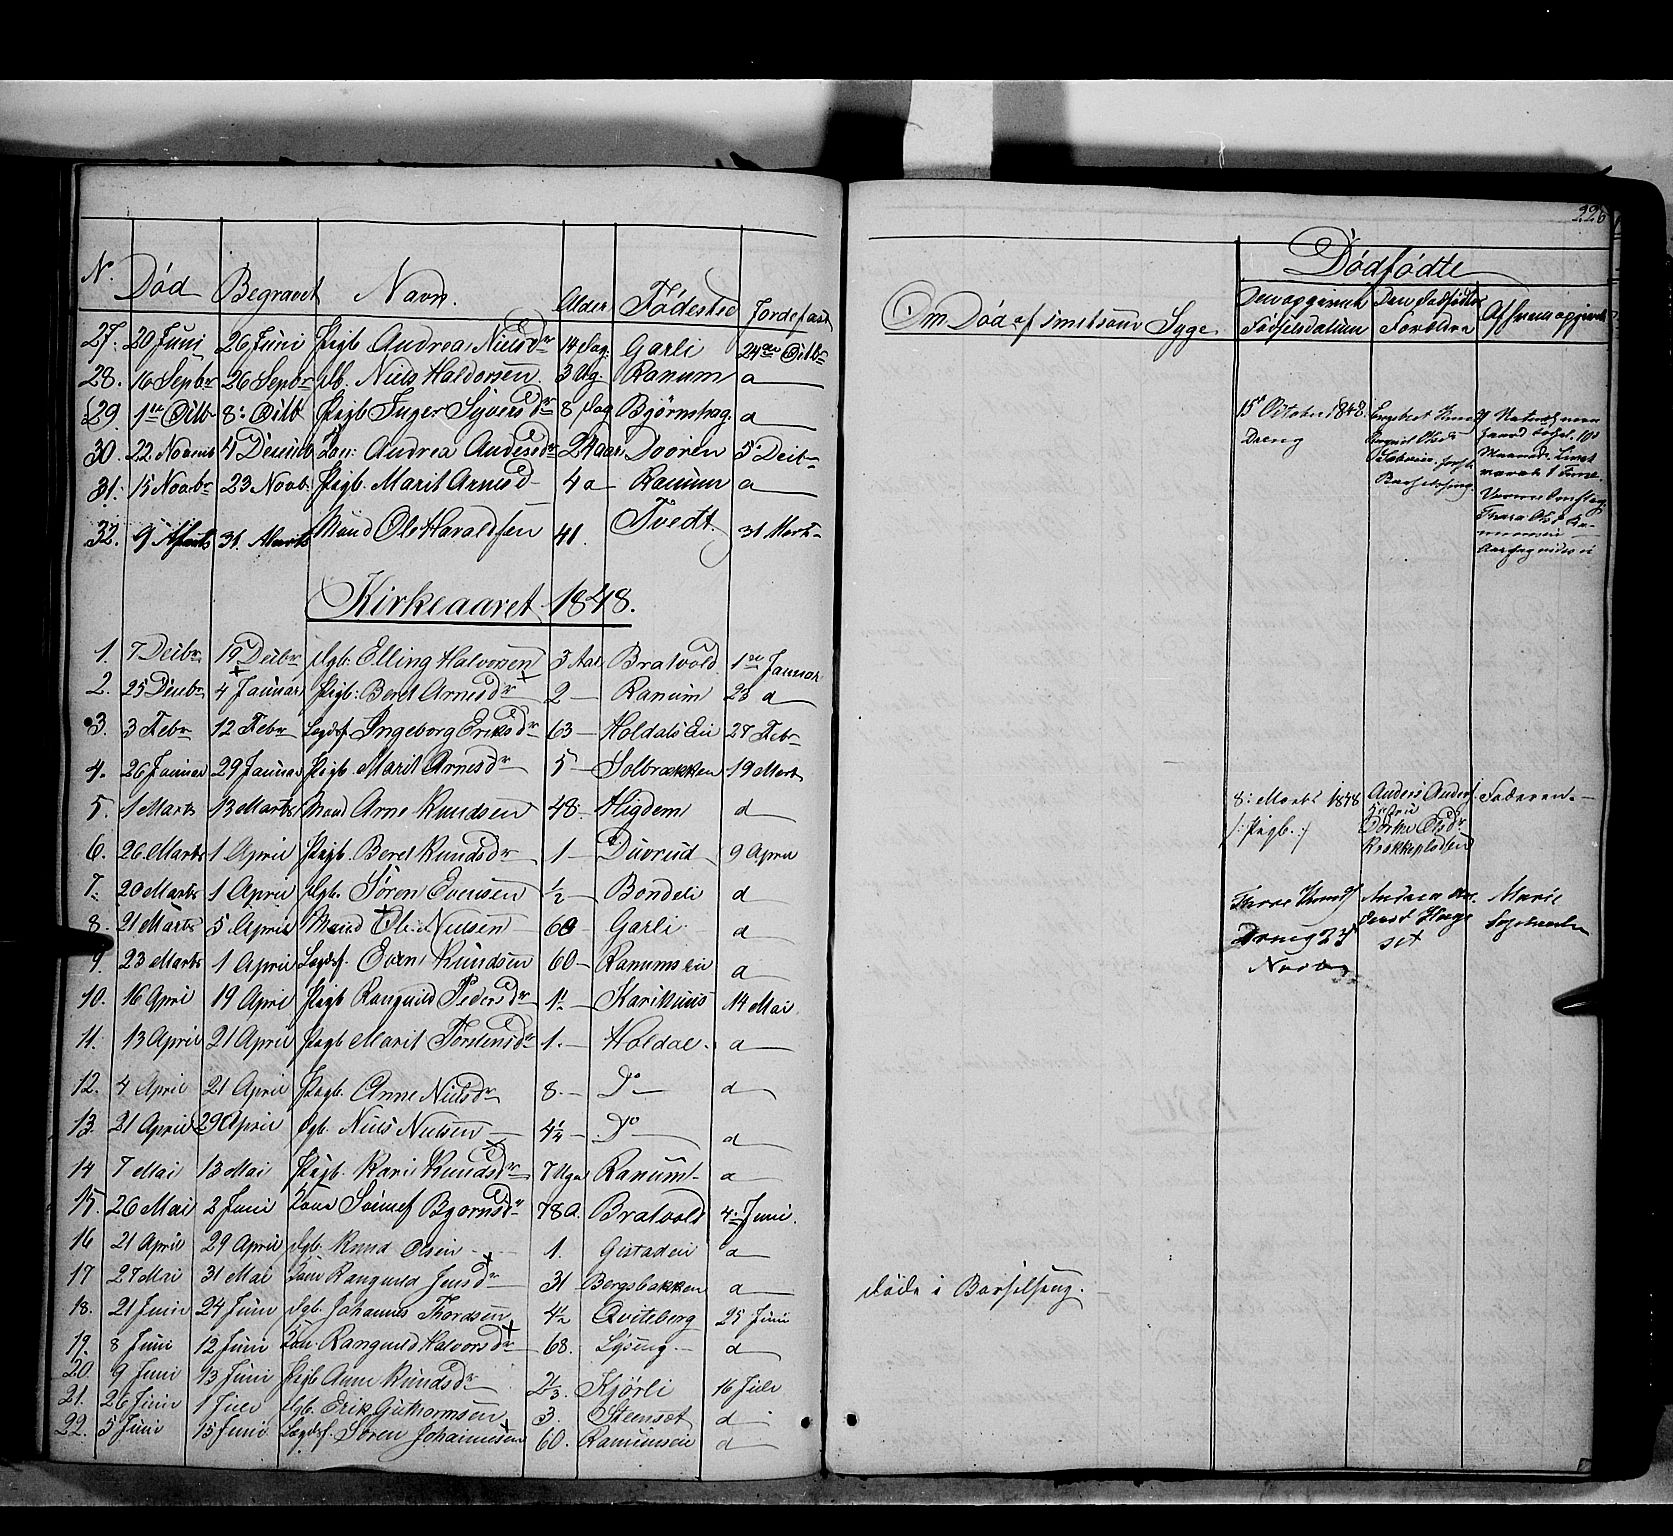 SAH, Nord-Aurdal prestekontor, Ministerialbok nr. 7, 1842-1863, s. 226